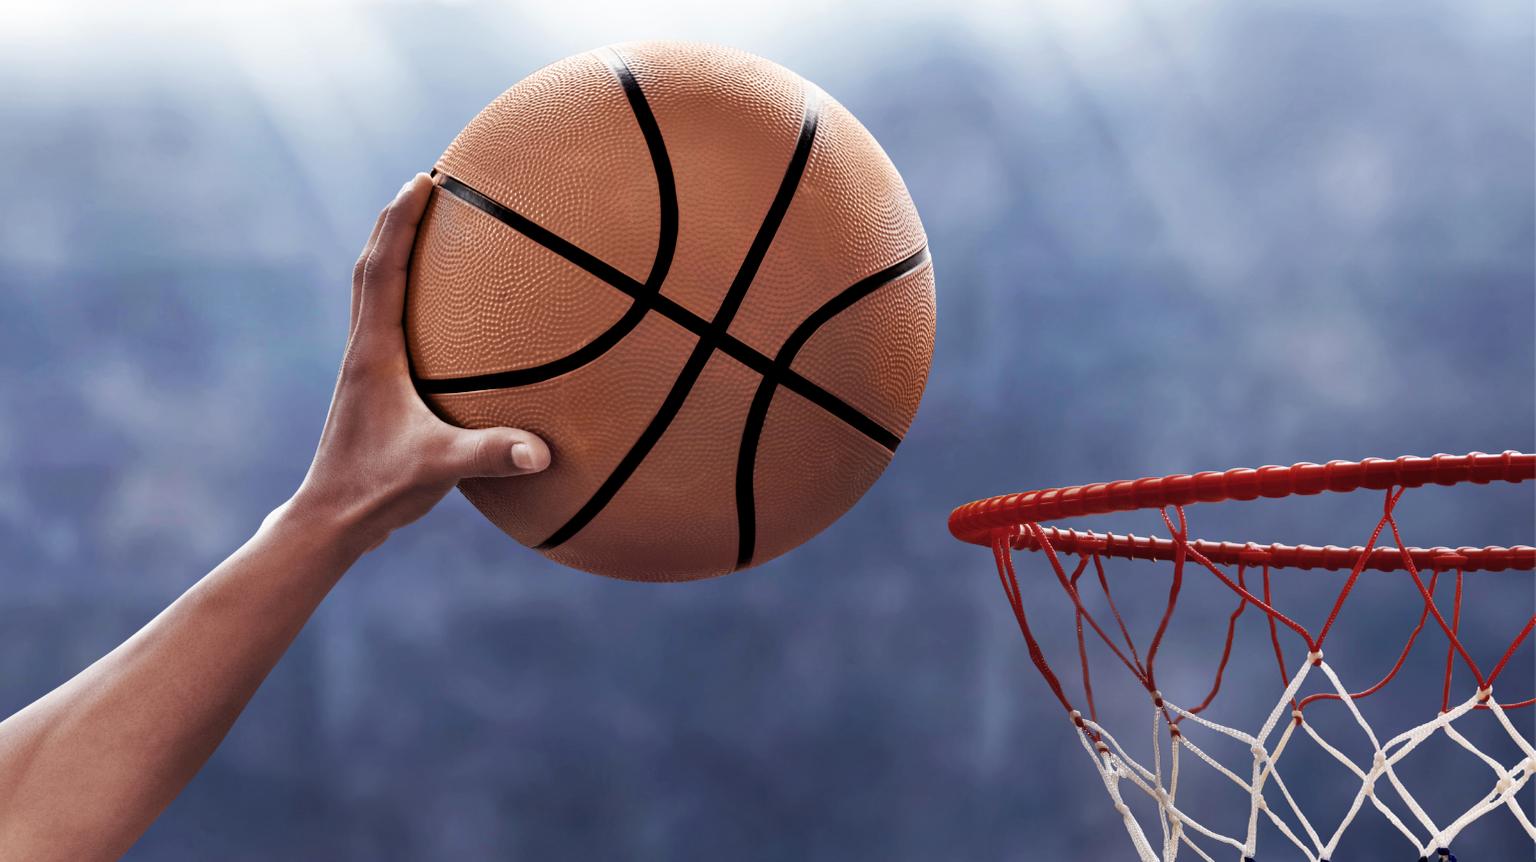 Hand dunking basketball